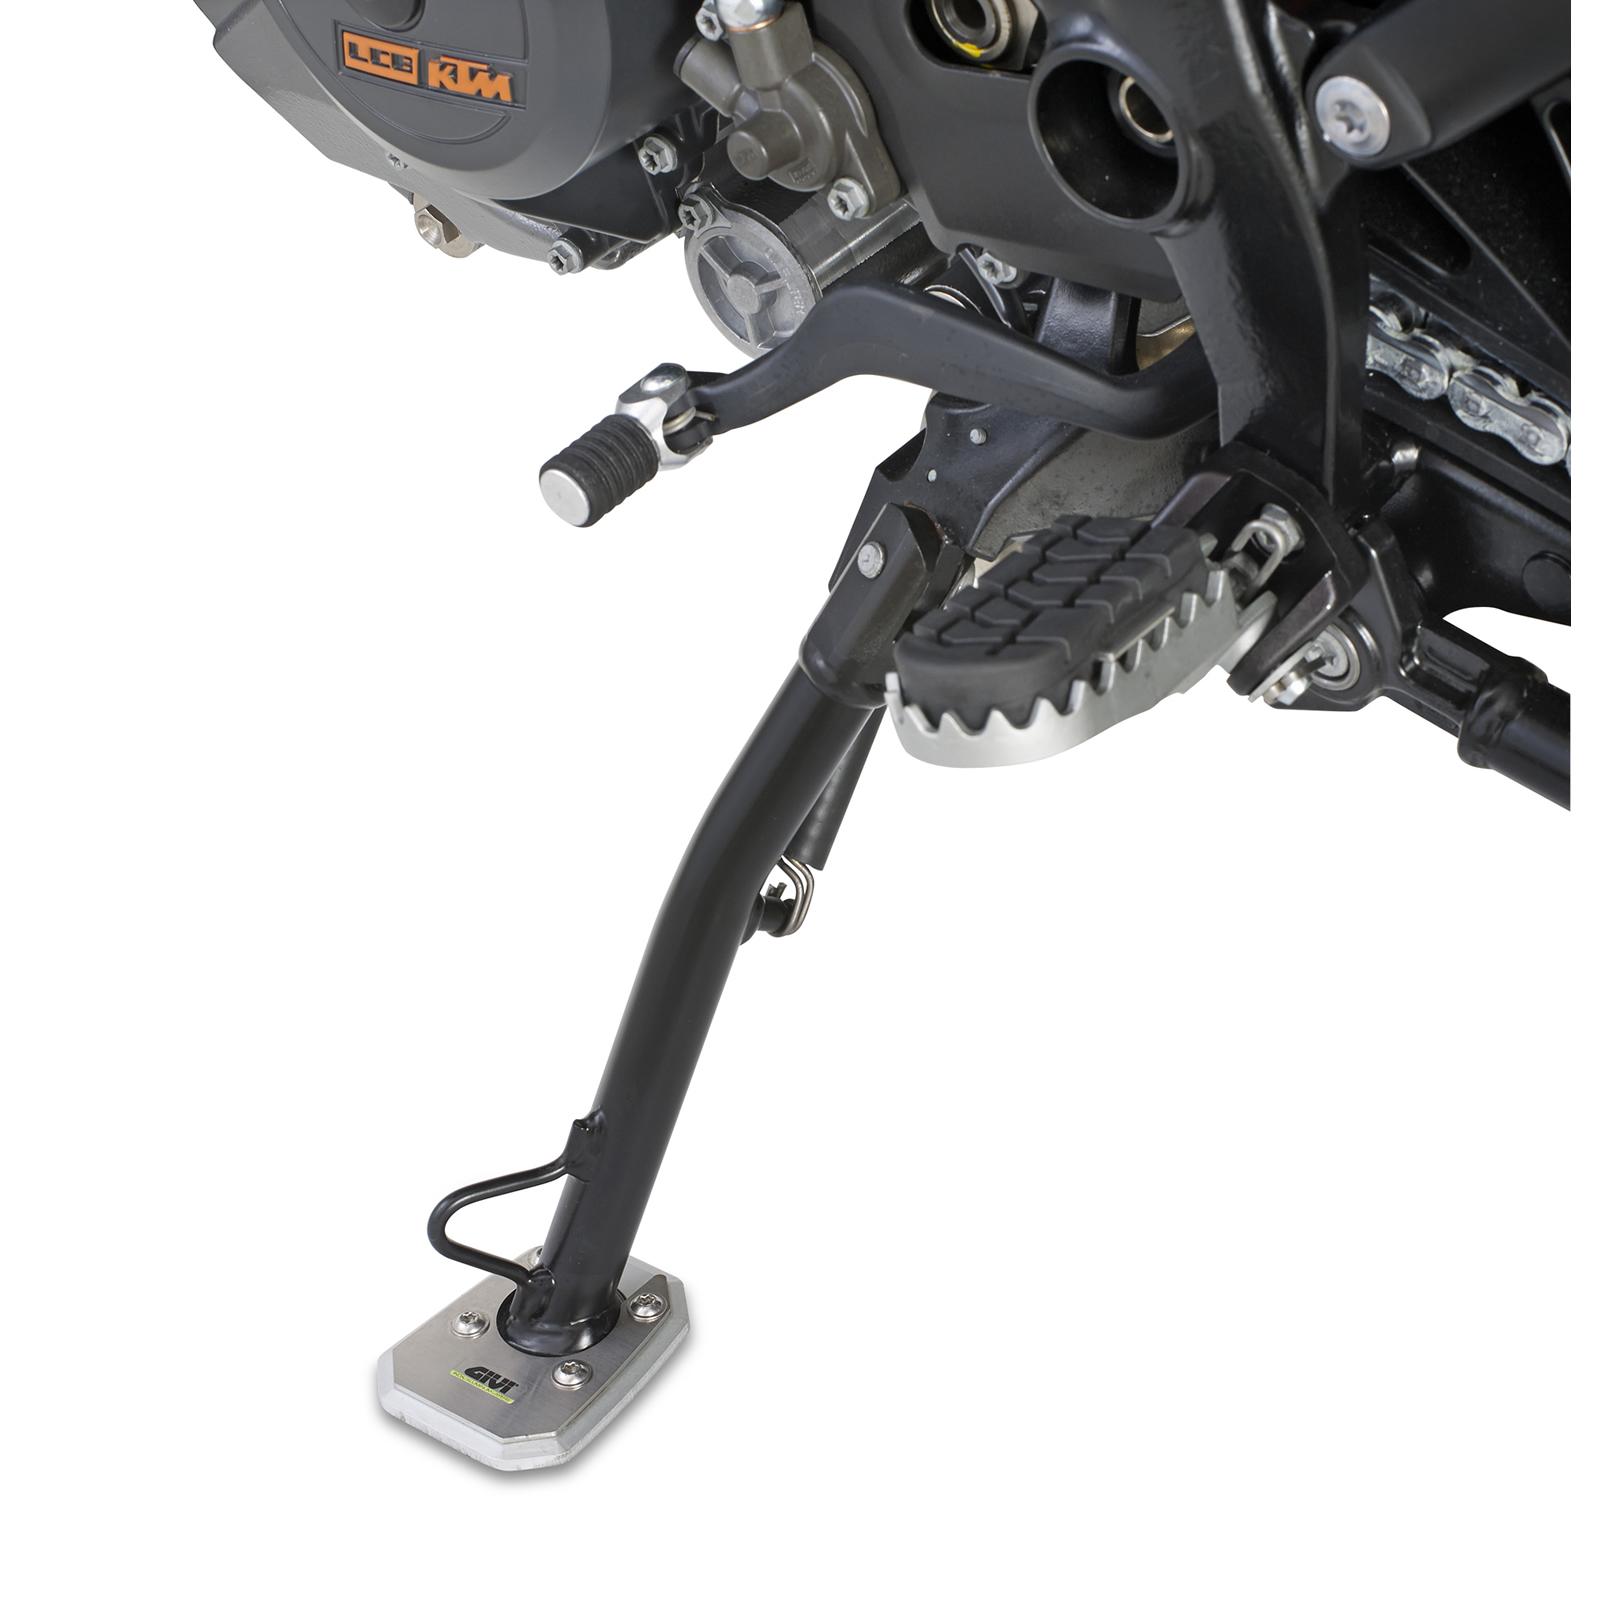 givi es684 motorcycle motorbike side stand support mount foot bmw r1200 gs 04 05. Black Bedroom Furniture Sets. Home Design Ideas